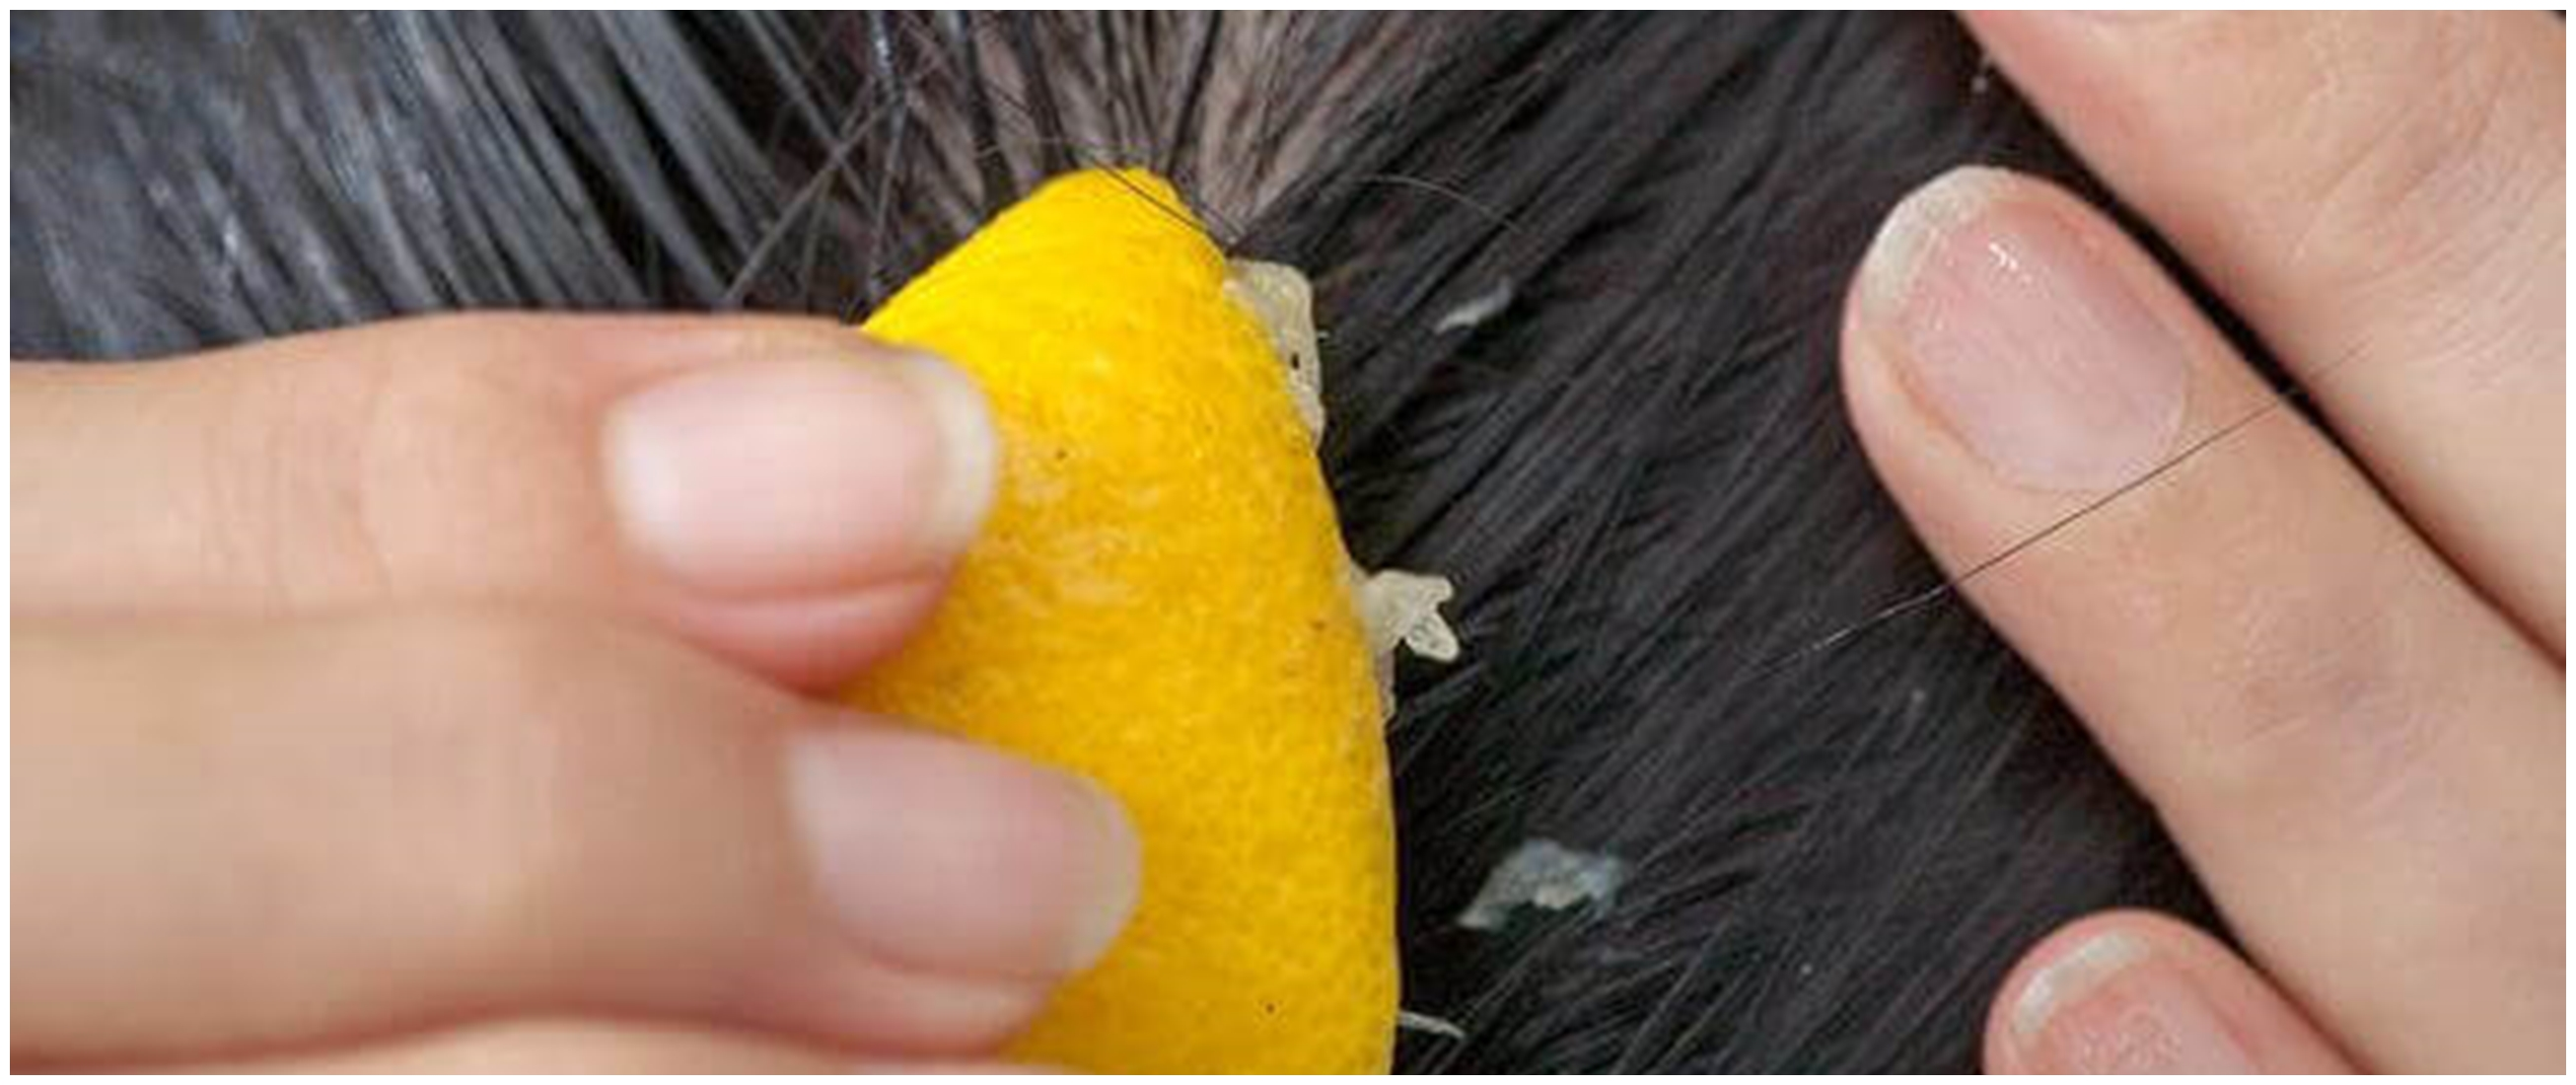 8 Cara menghilangkan ketombe dengan lemon, aman & ampuh